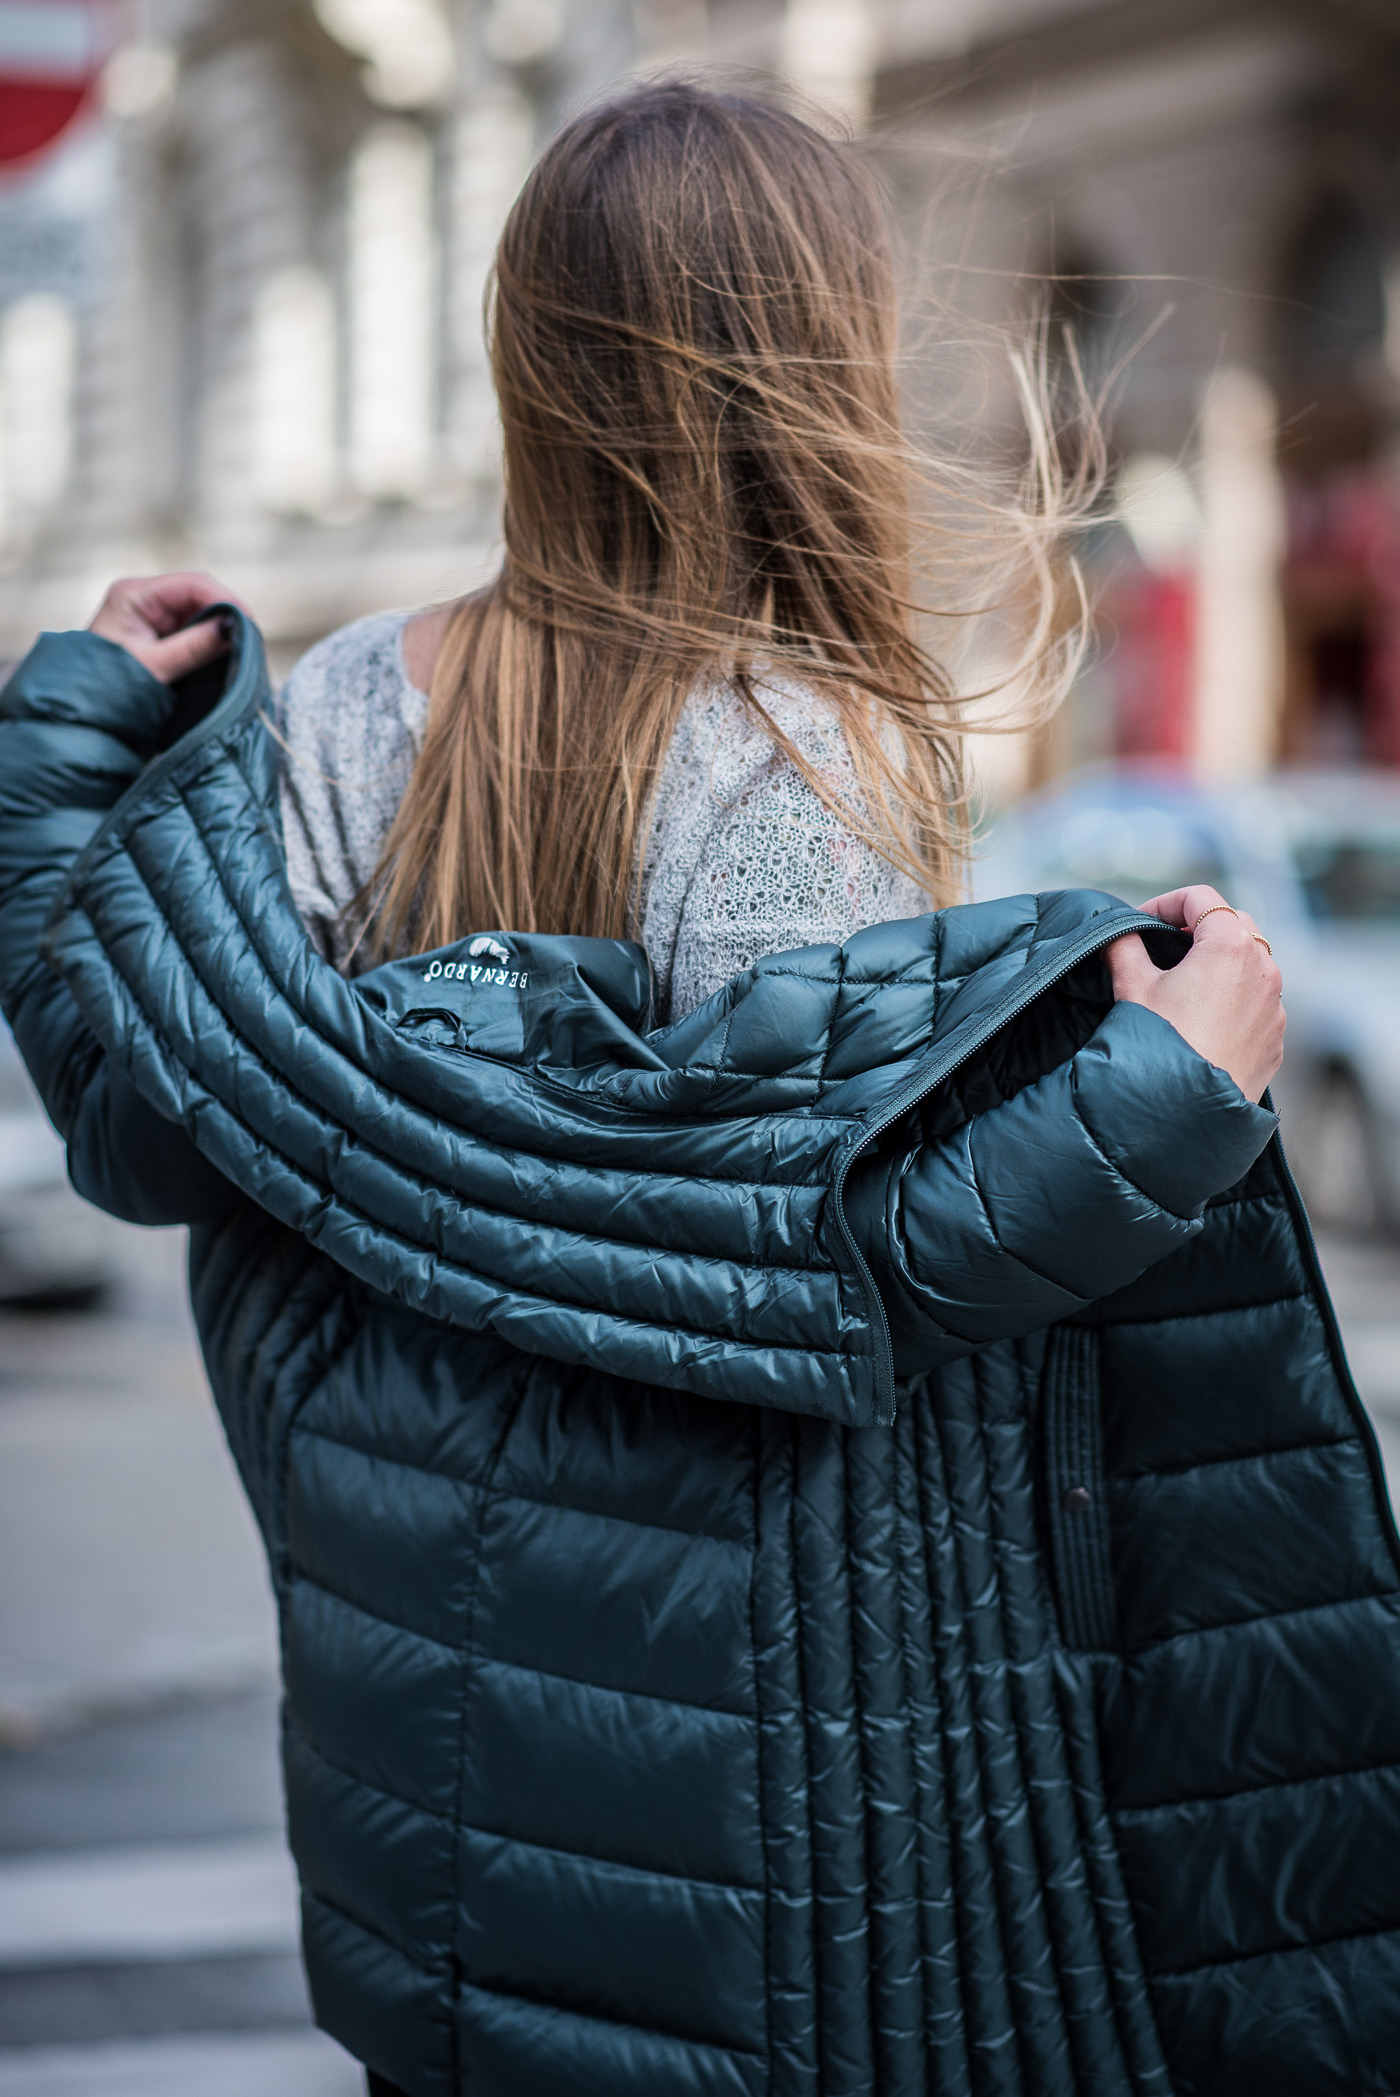 bernardo_down_jacket_daunenjacke_4